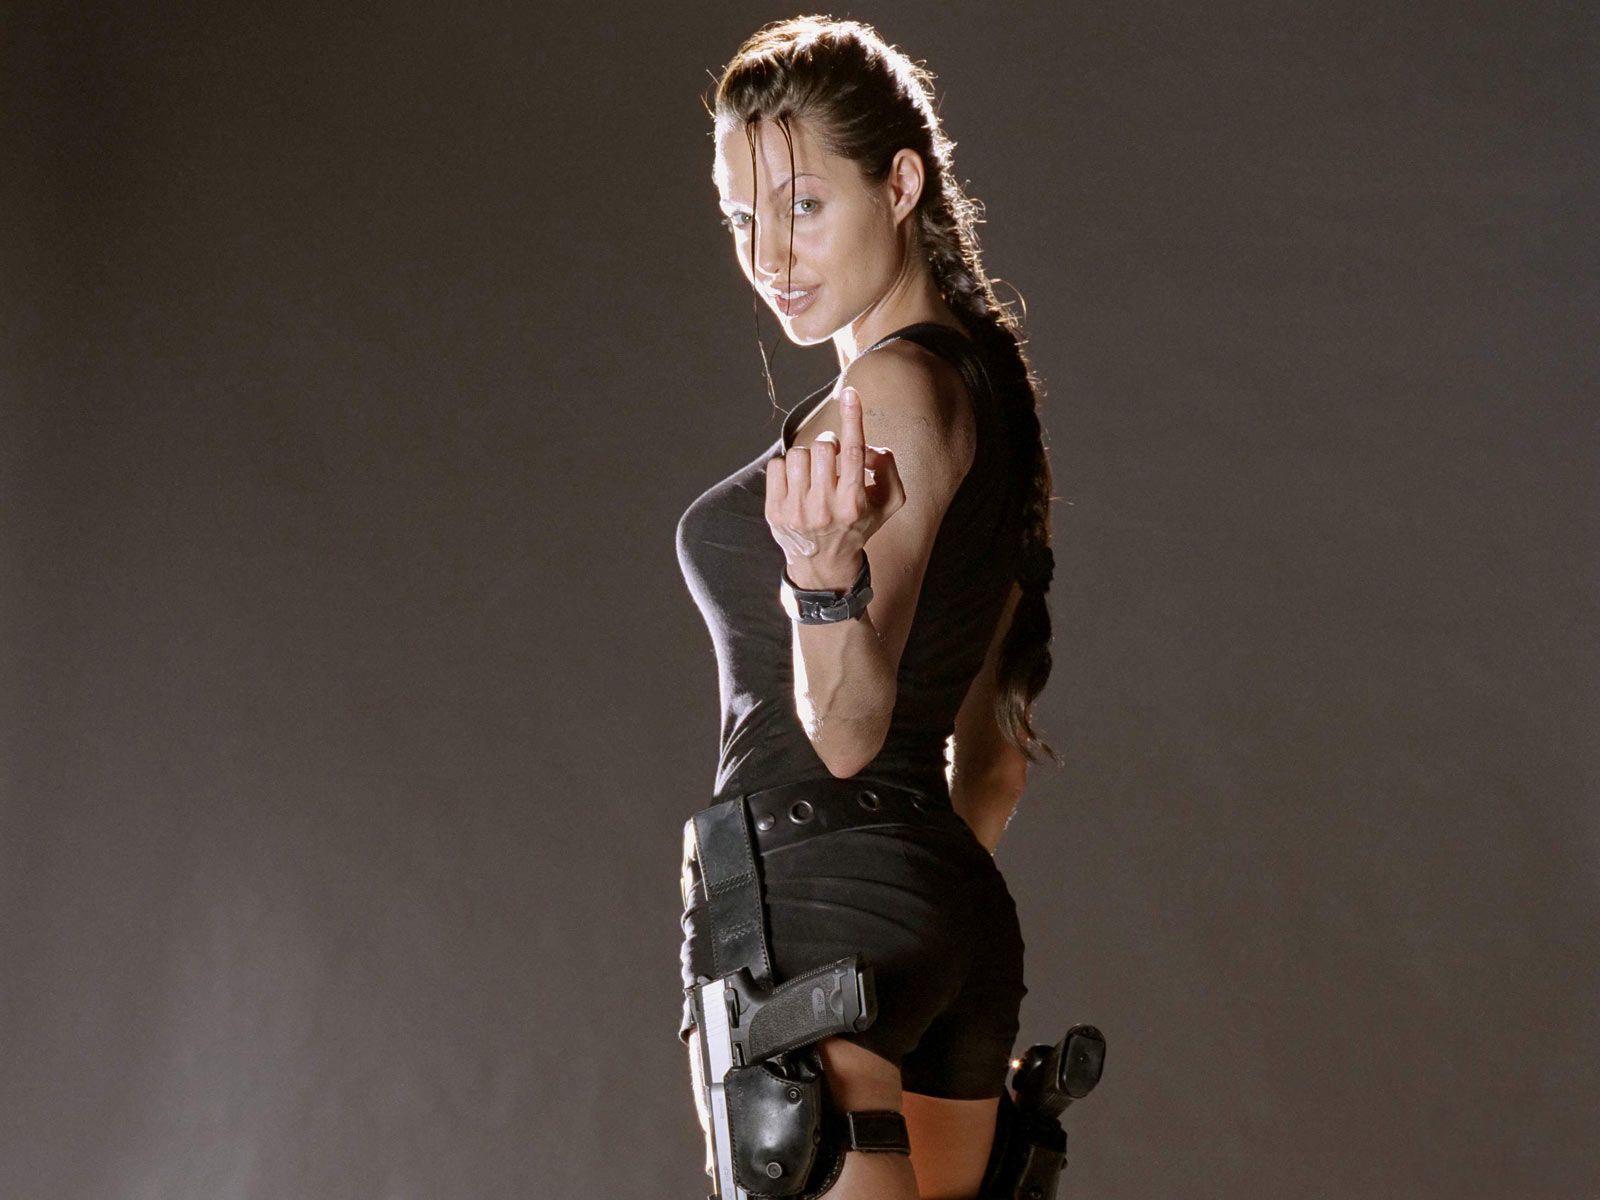 Bons Rapazes Angelina Jolie 40 anos 6